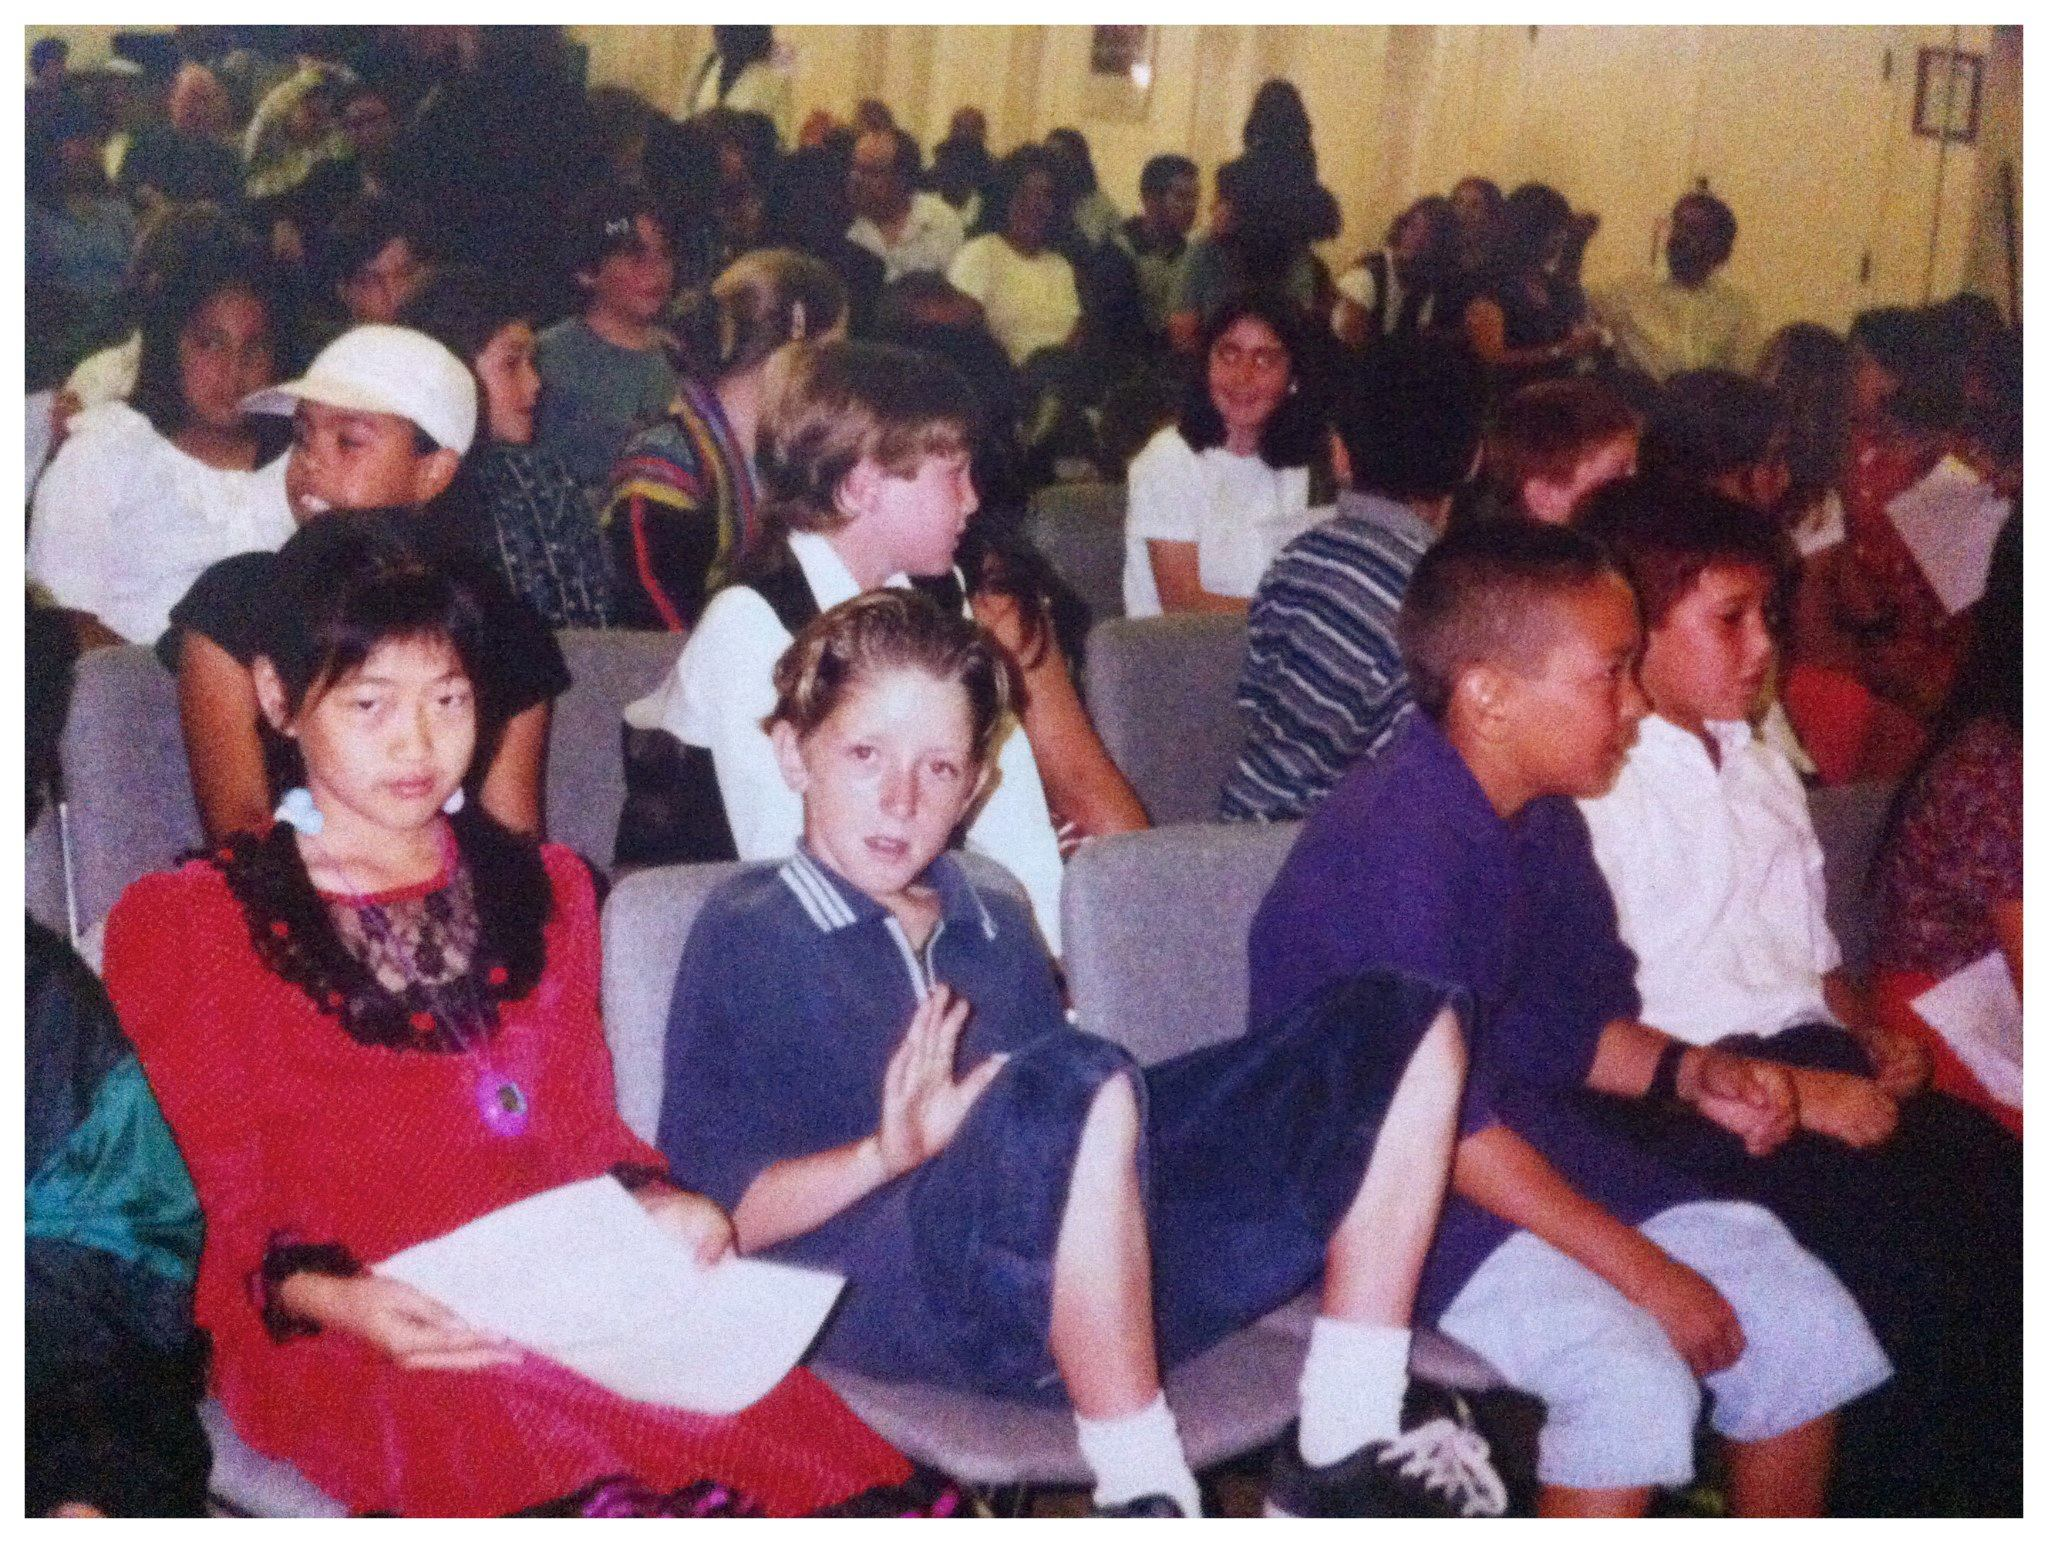 1996: 5th Grade graduation at Will Rogers Elementary School in Santa Monica, California